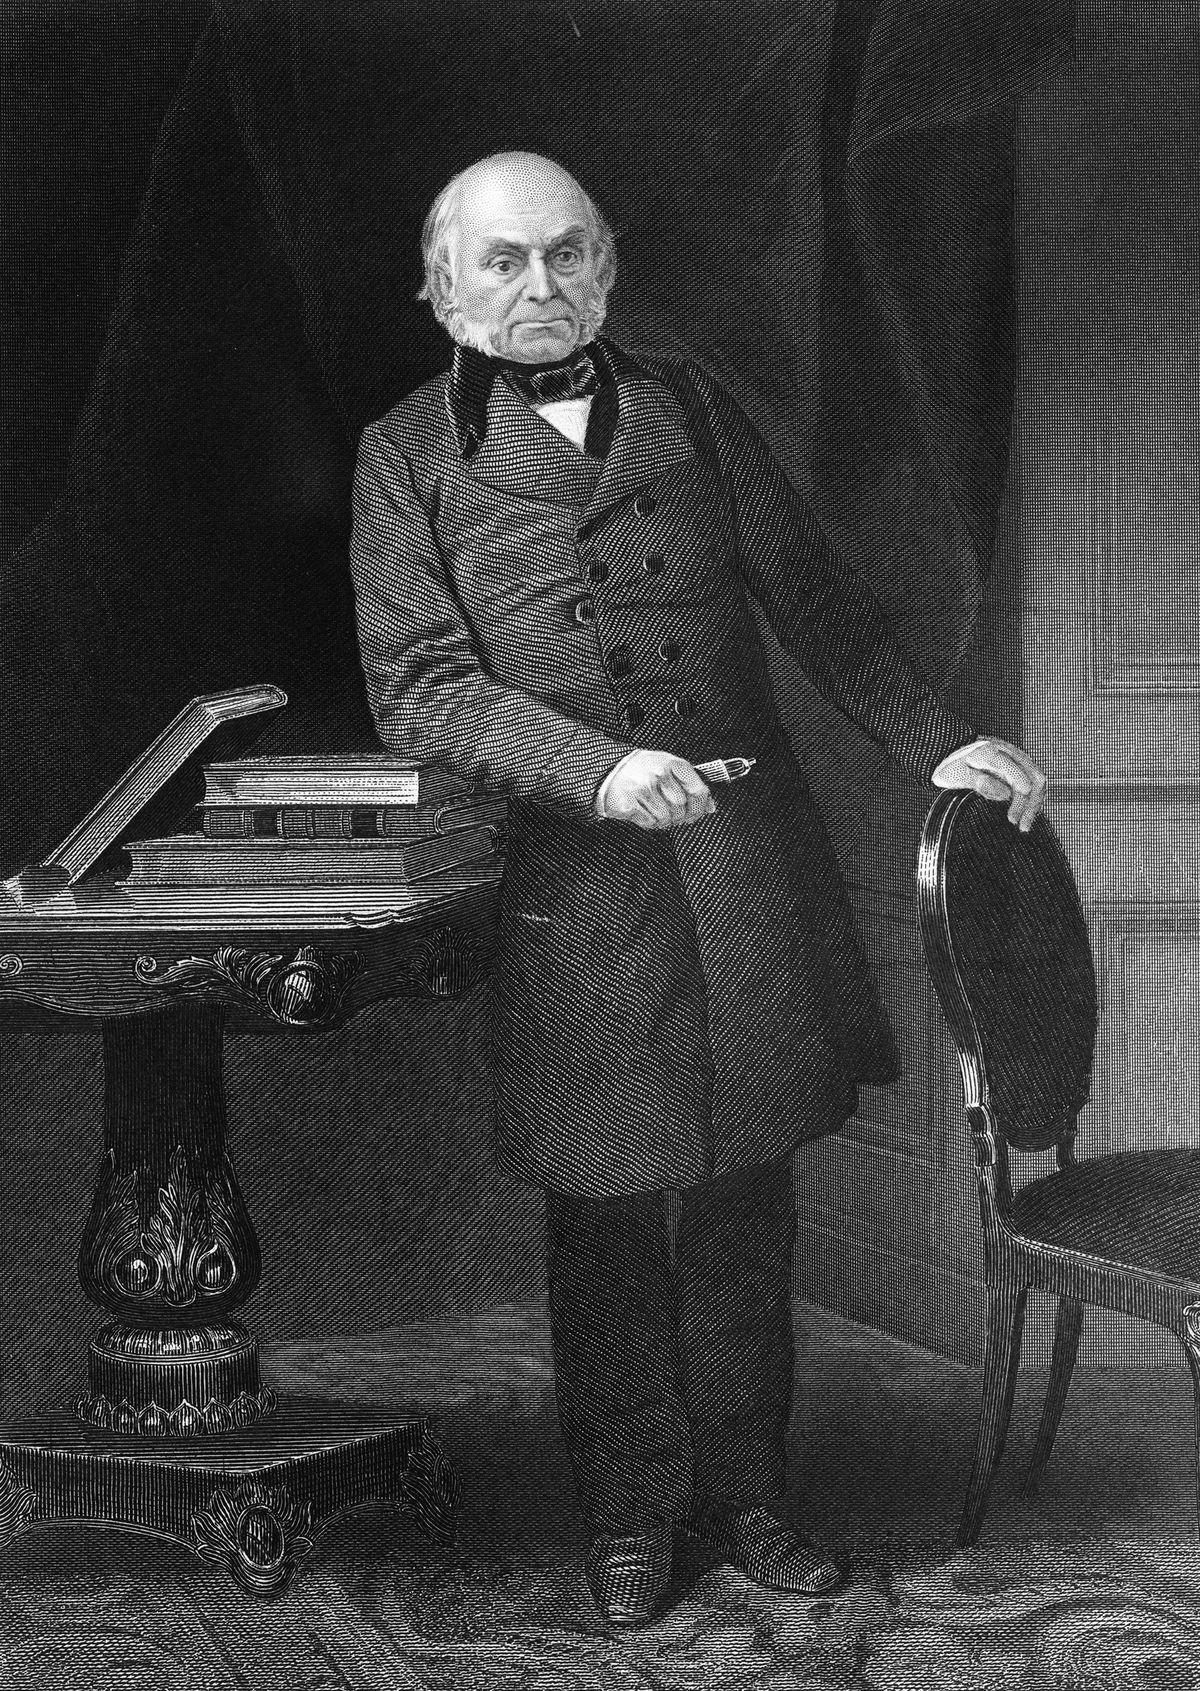 John Quincy Adams, wearing pants in circa 1825 portrait